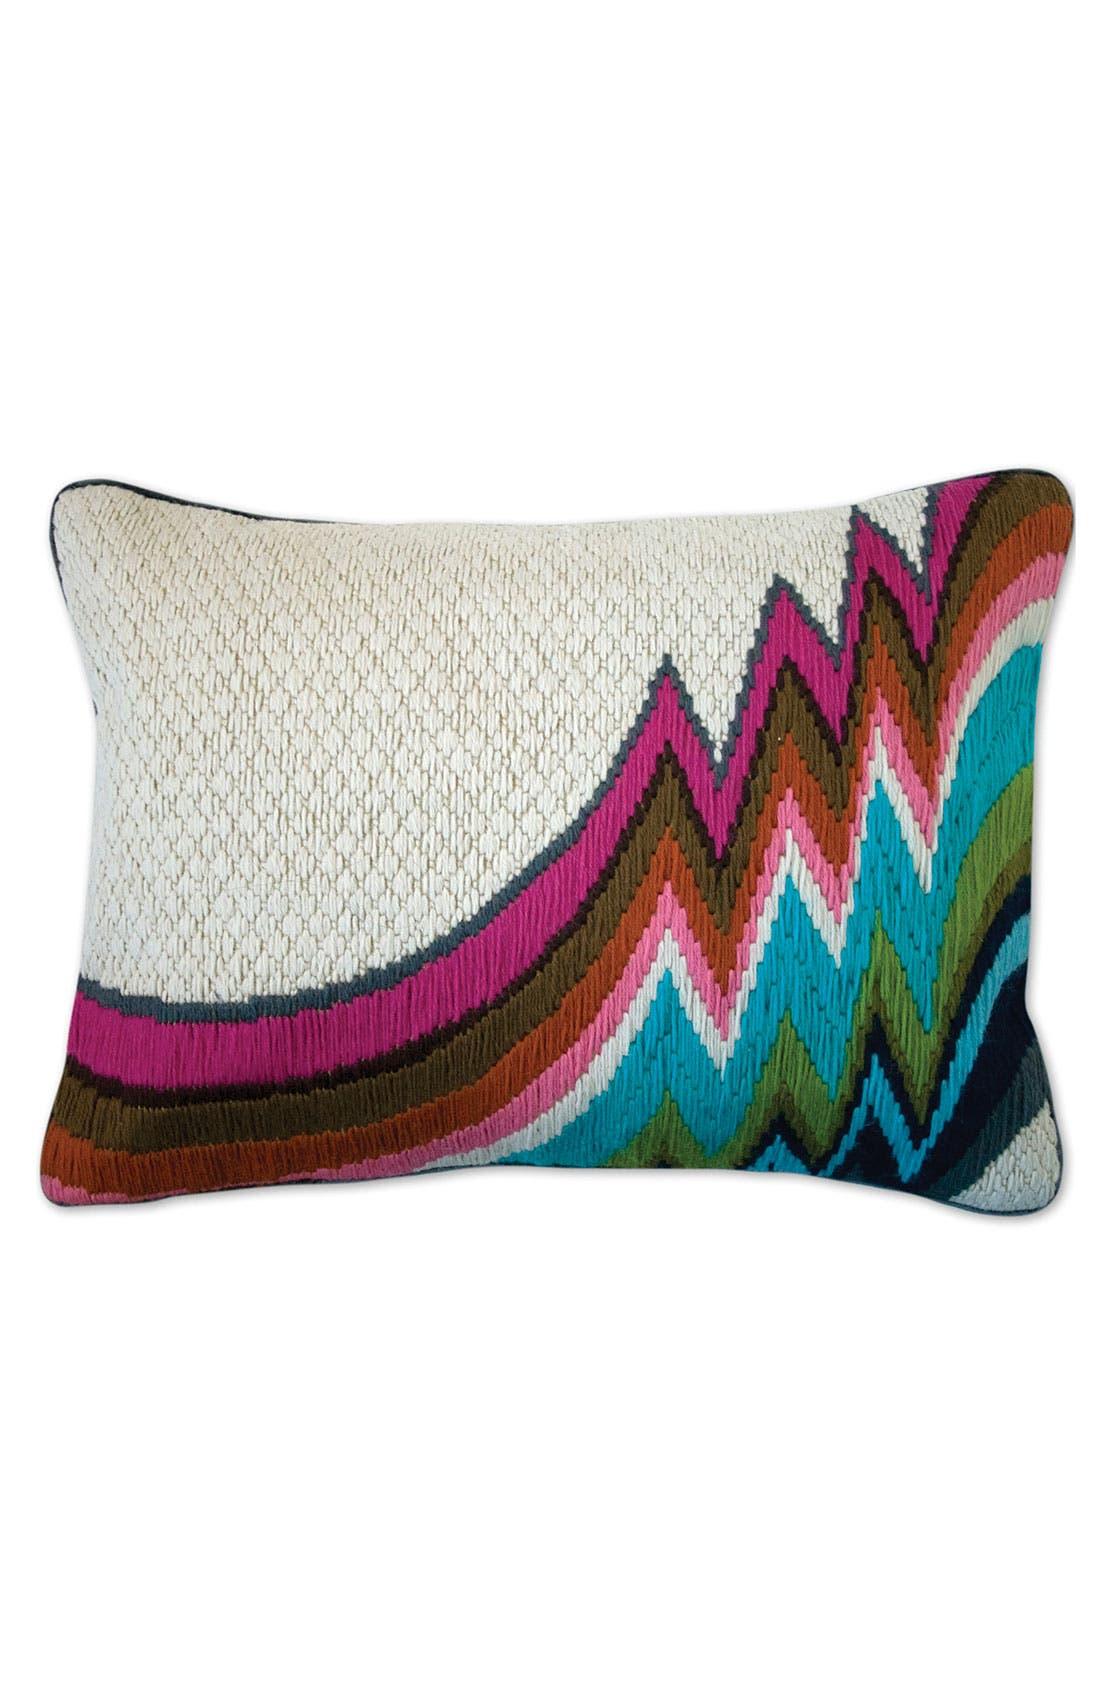 Main Image - Jonathan Adler 'Jamaica Lane Bargello' Pillow